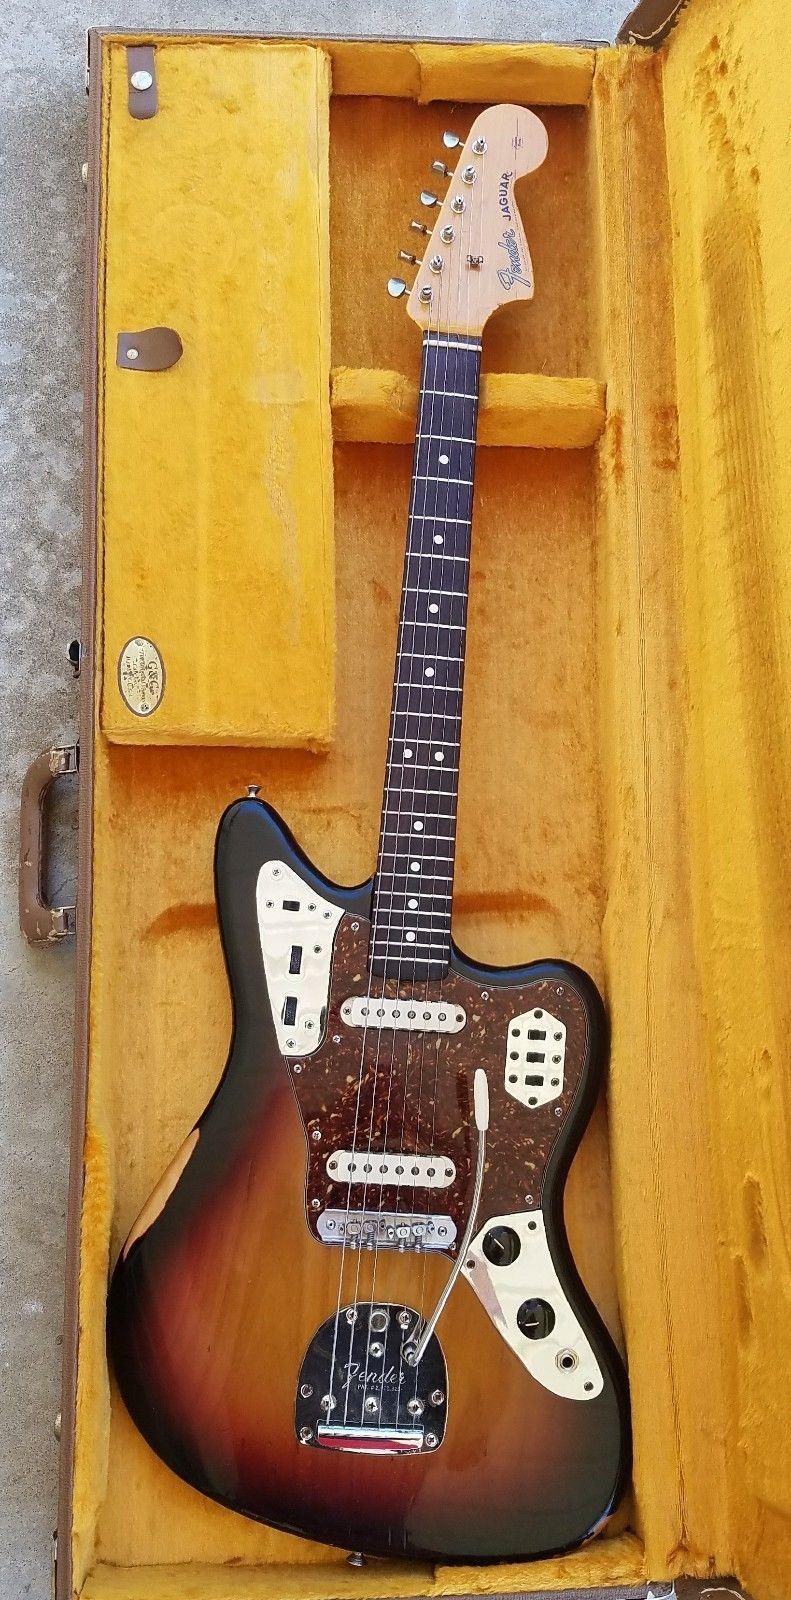 Fender Jaguar American Vintage 62 With Mastery Bridge